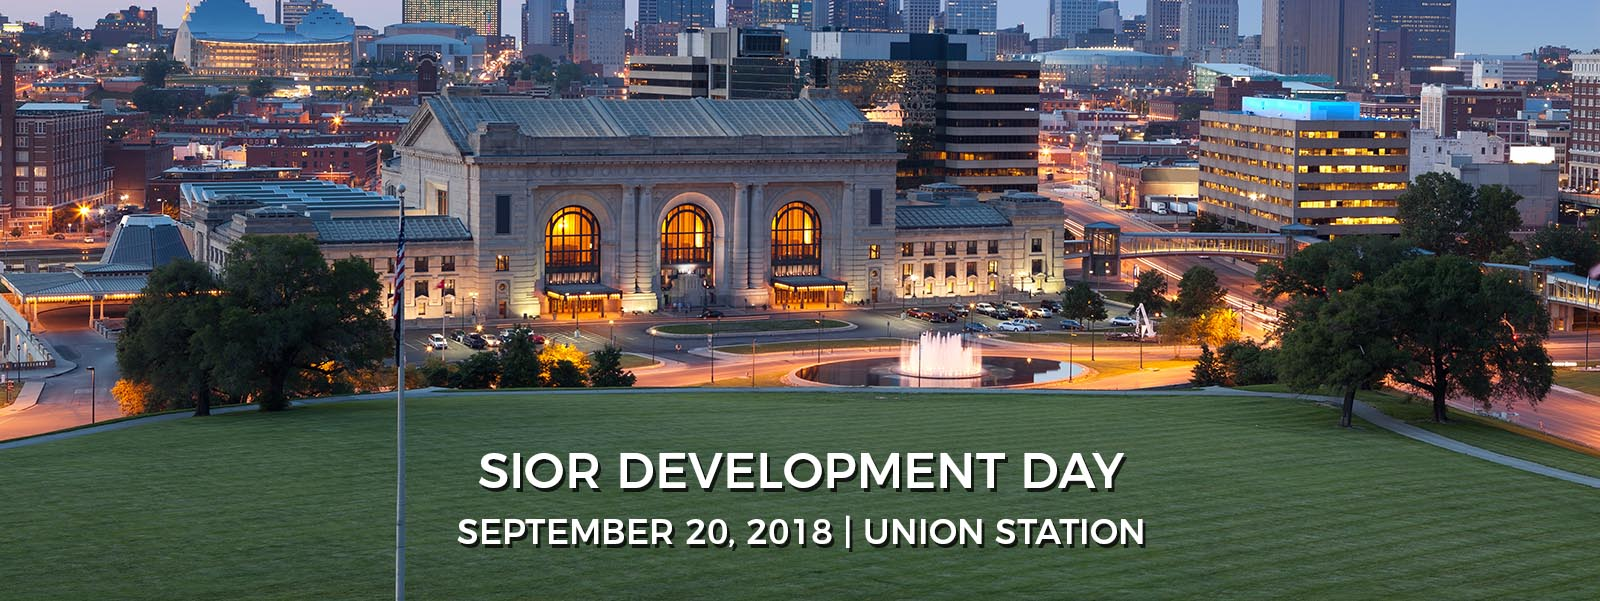 2018 Development Day